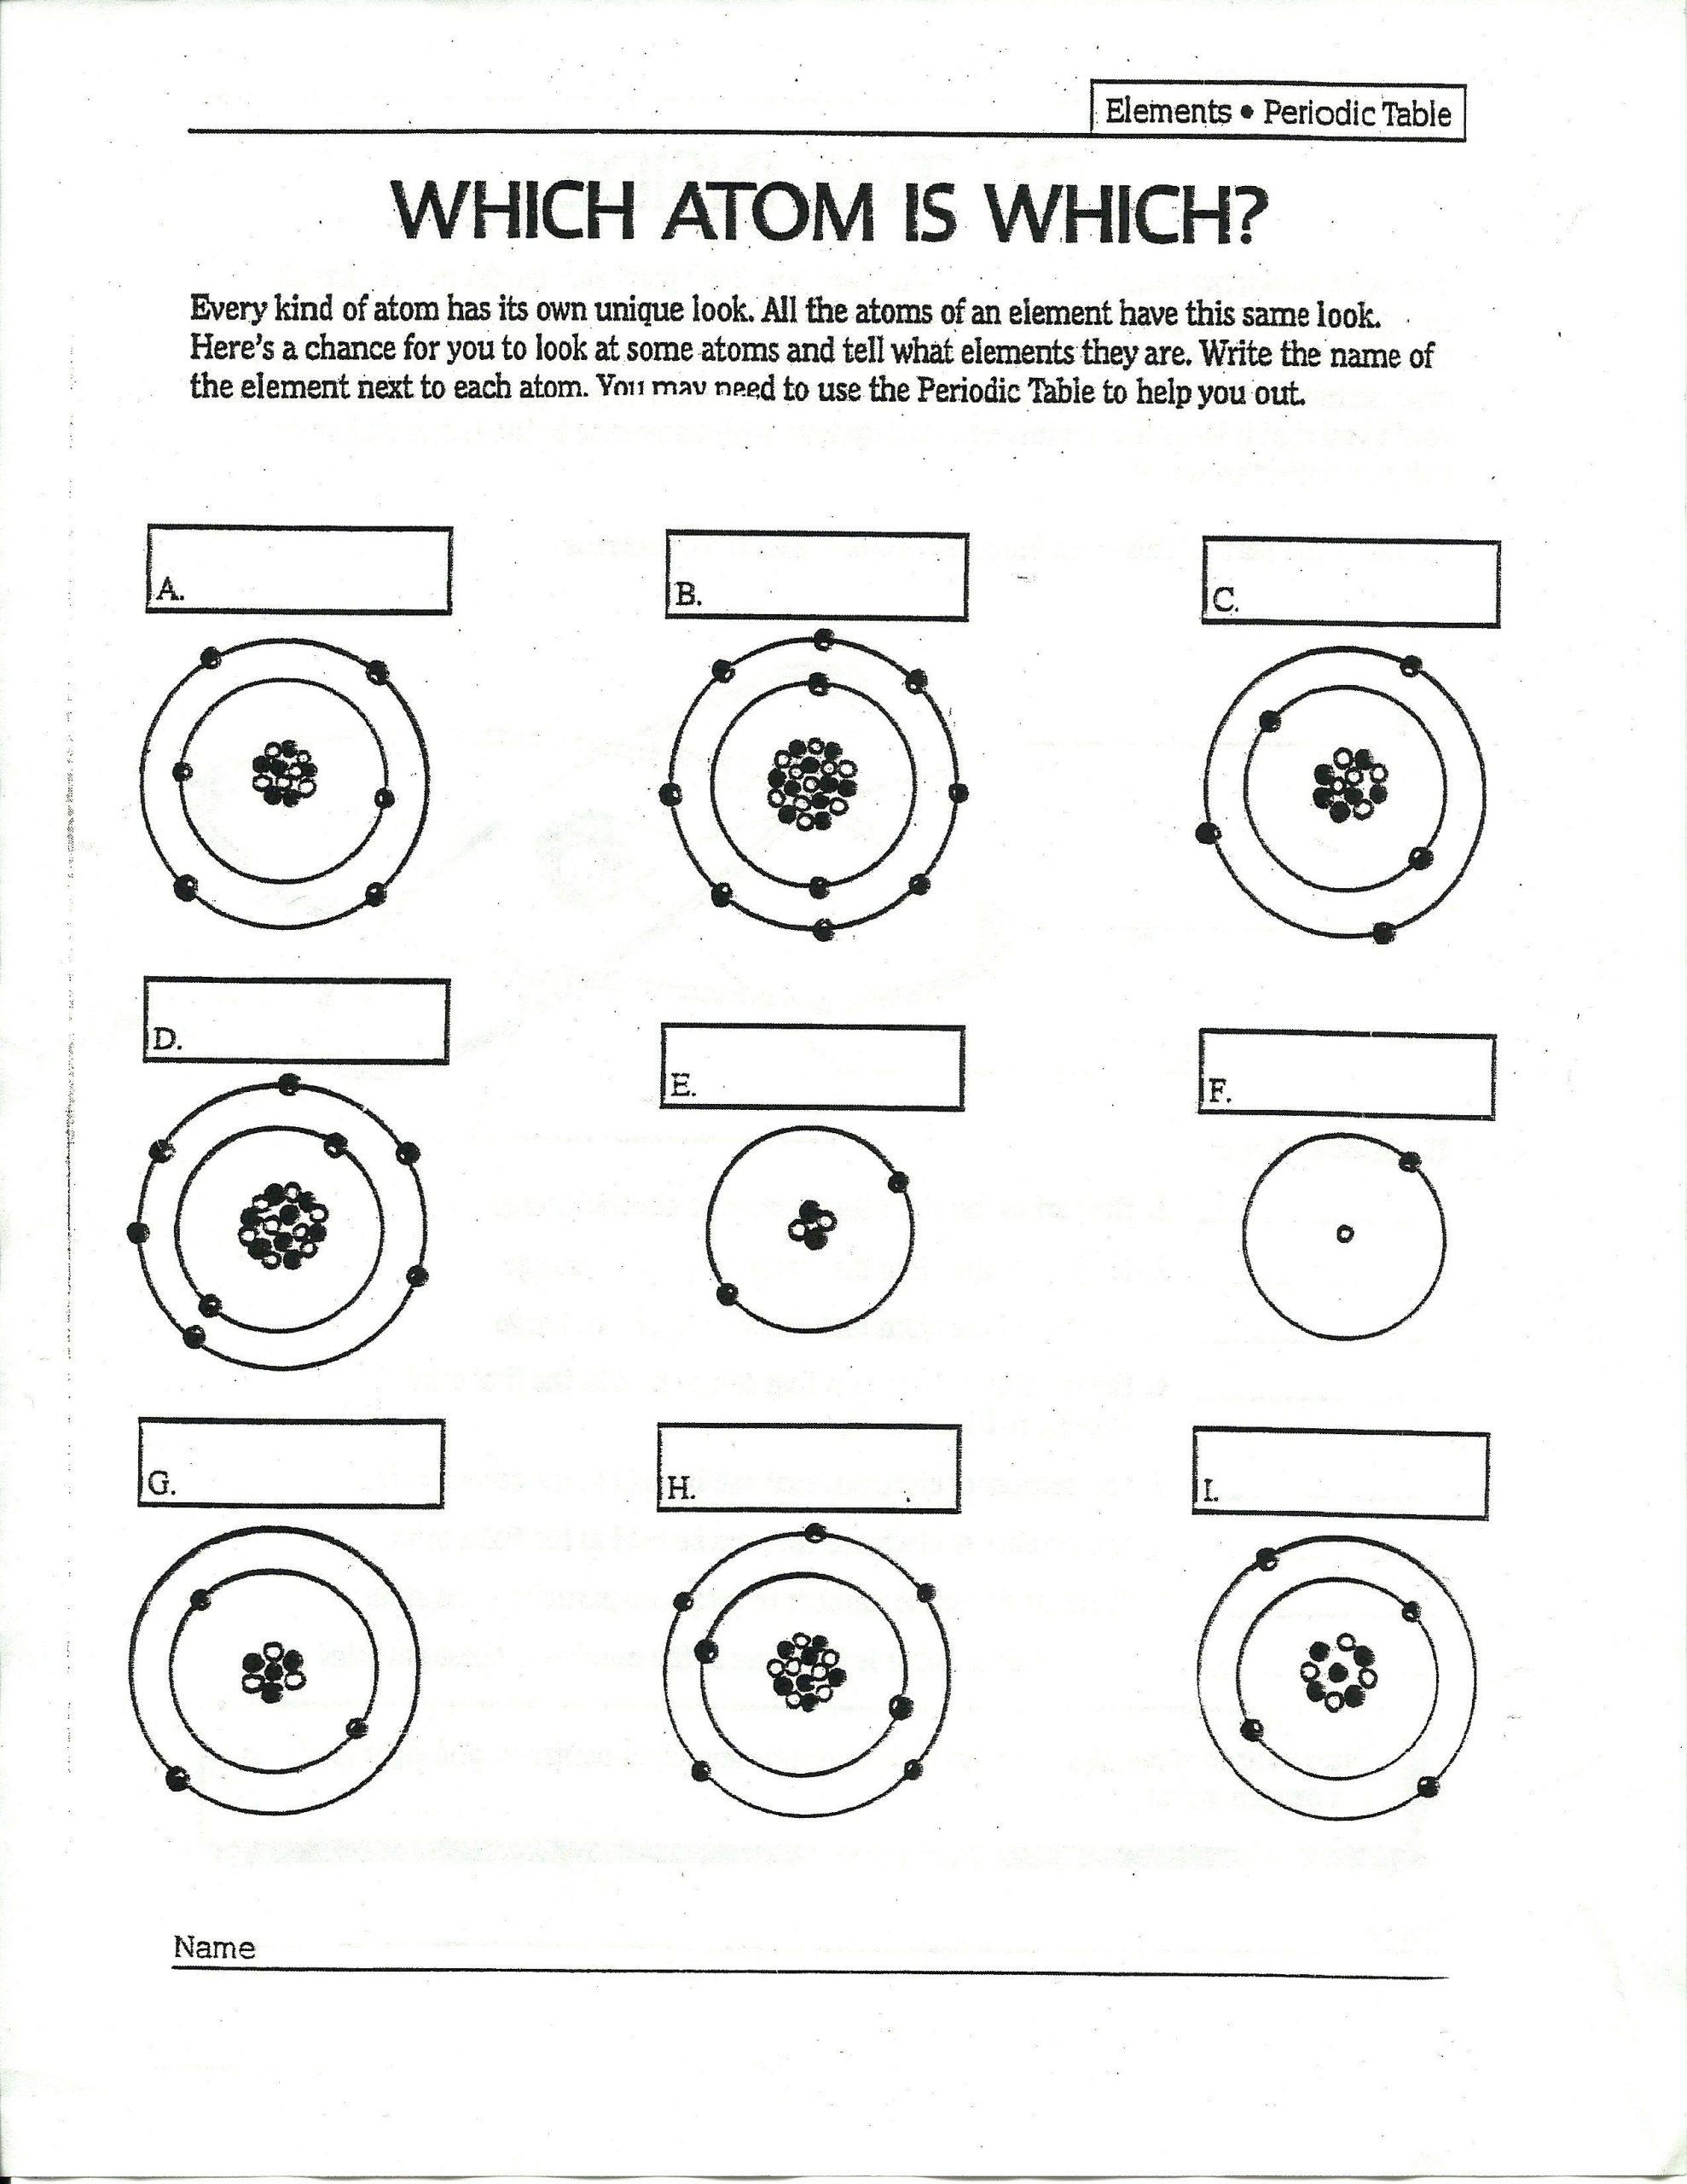 Atomic Structure Worksheet Answer Key atomic Structure Bohr Model Worksheet